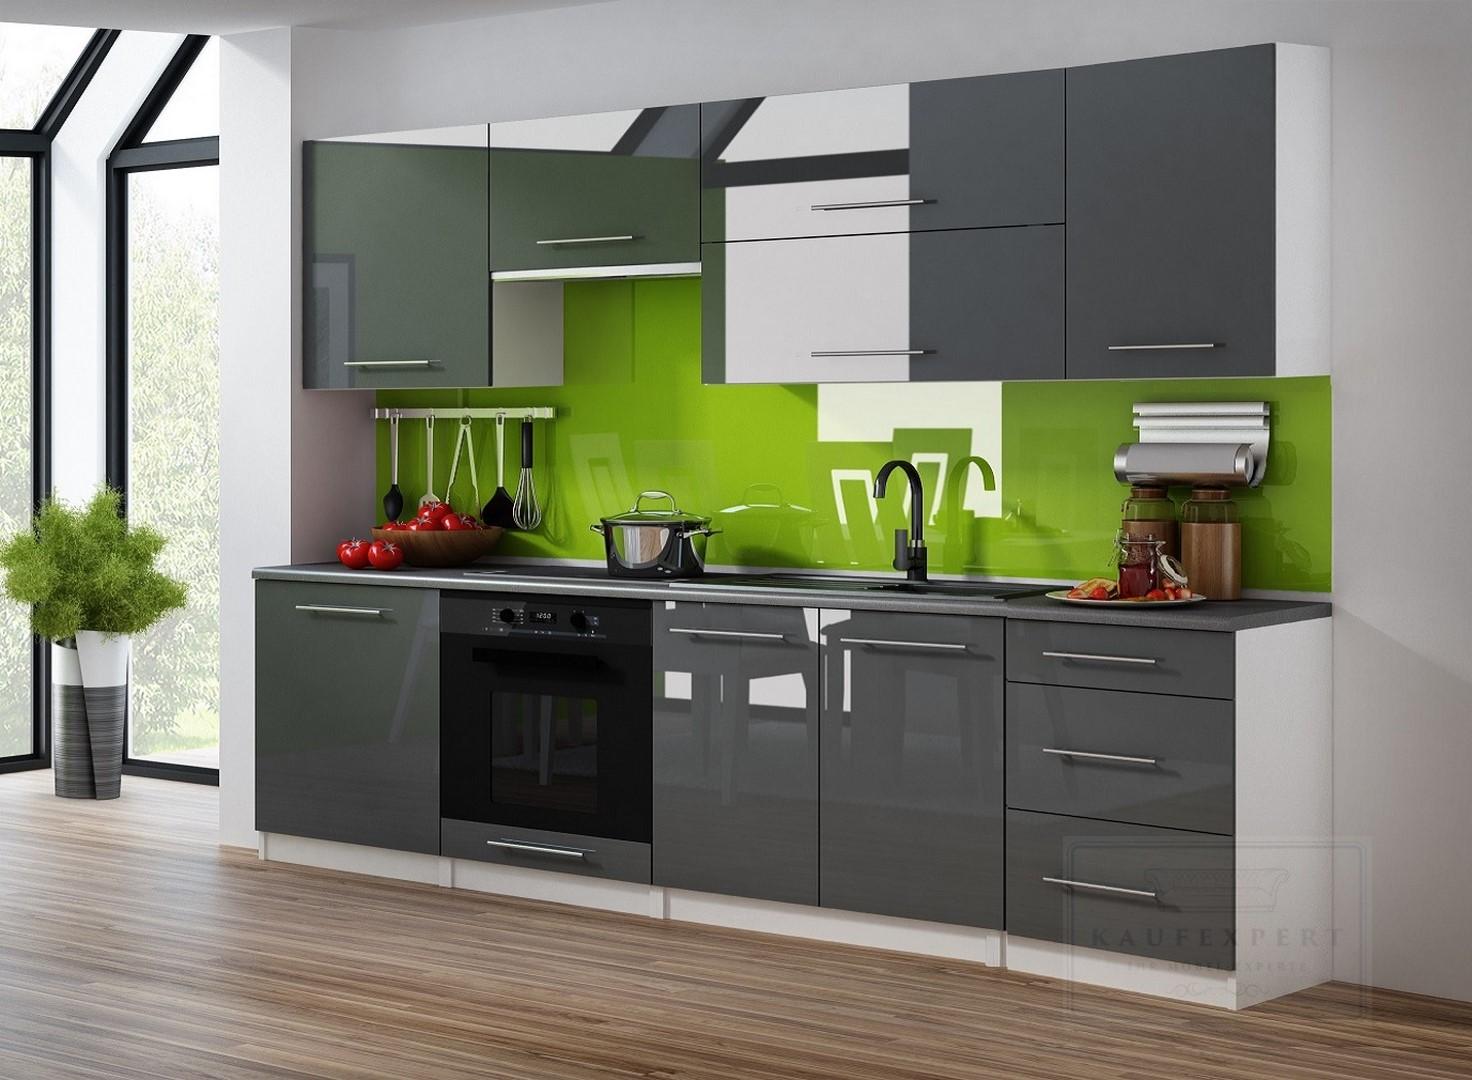 kaufexpert k chenzeile linda grau hochglanz 240 cm k che k chenblock mdf arbeitsplatte. Black Bedroom Furniture Sets. Home Design Ideas